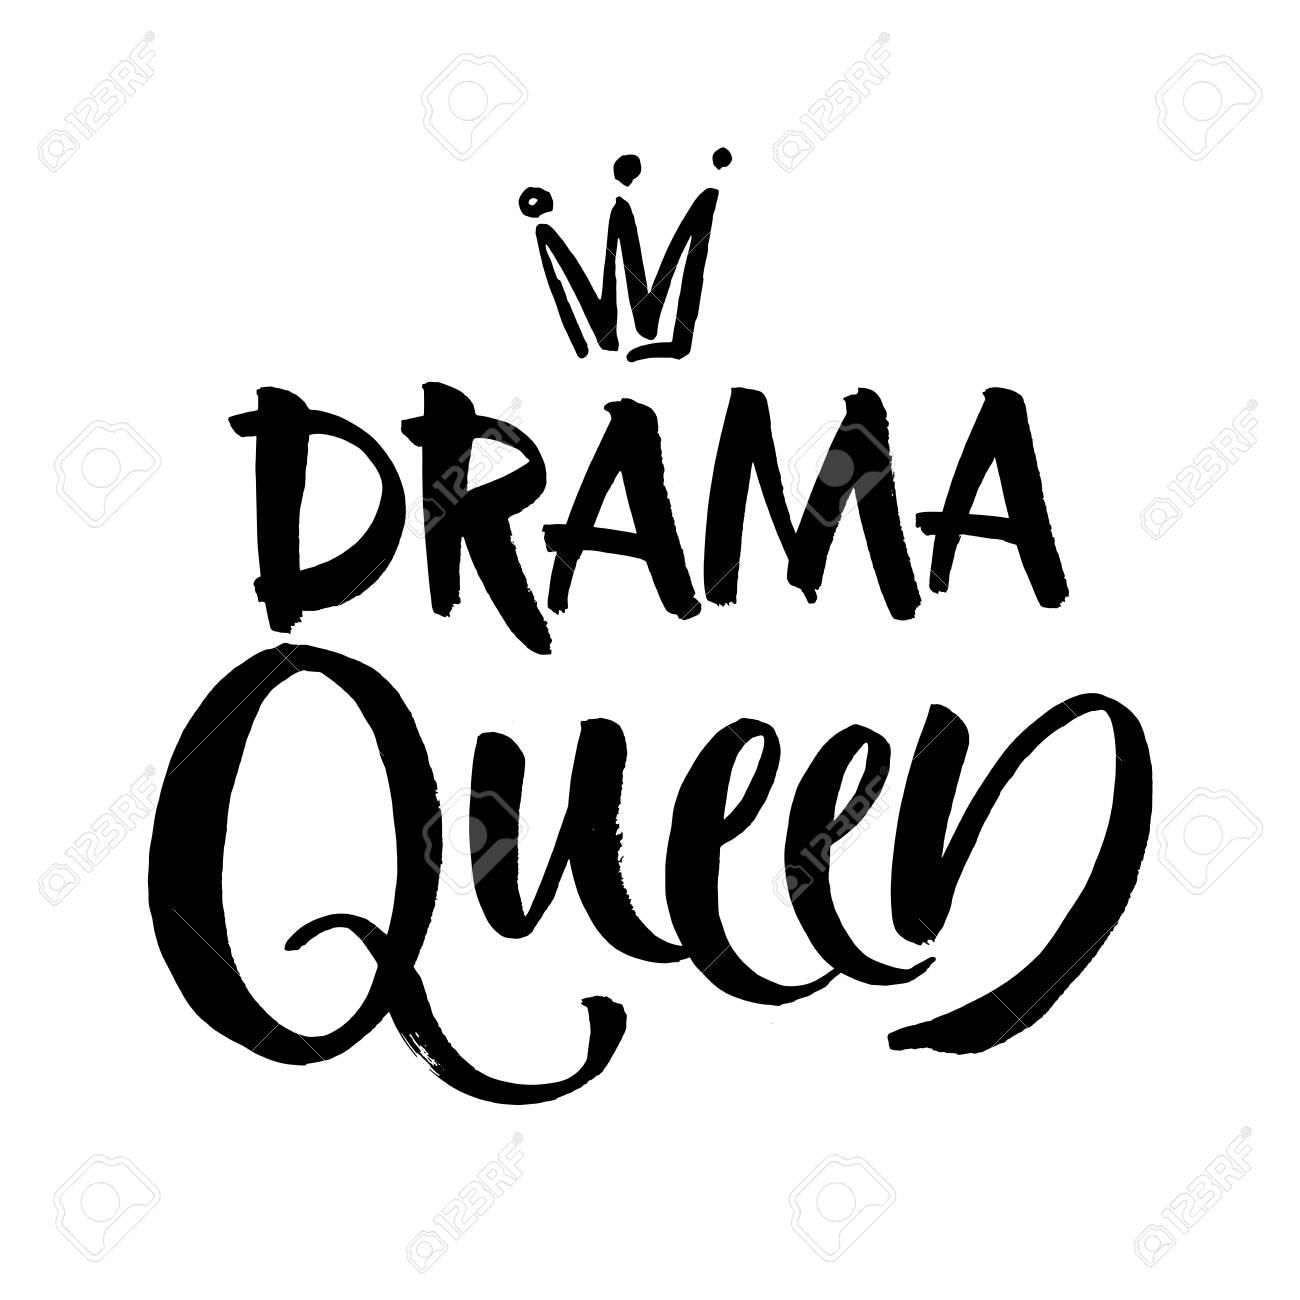 drama queen black and white hand lettering inscription, handwritten